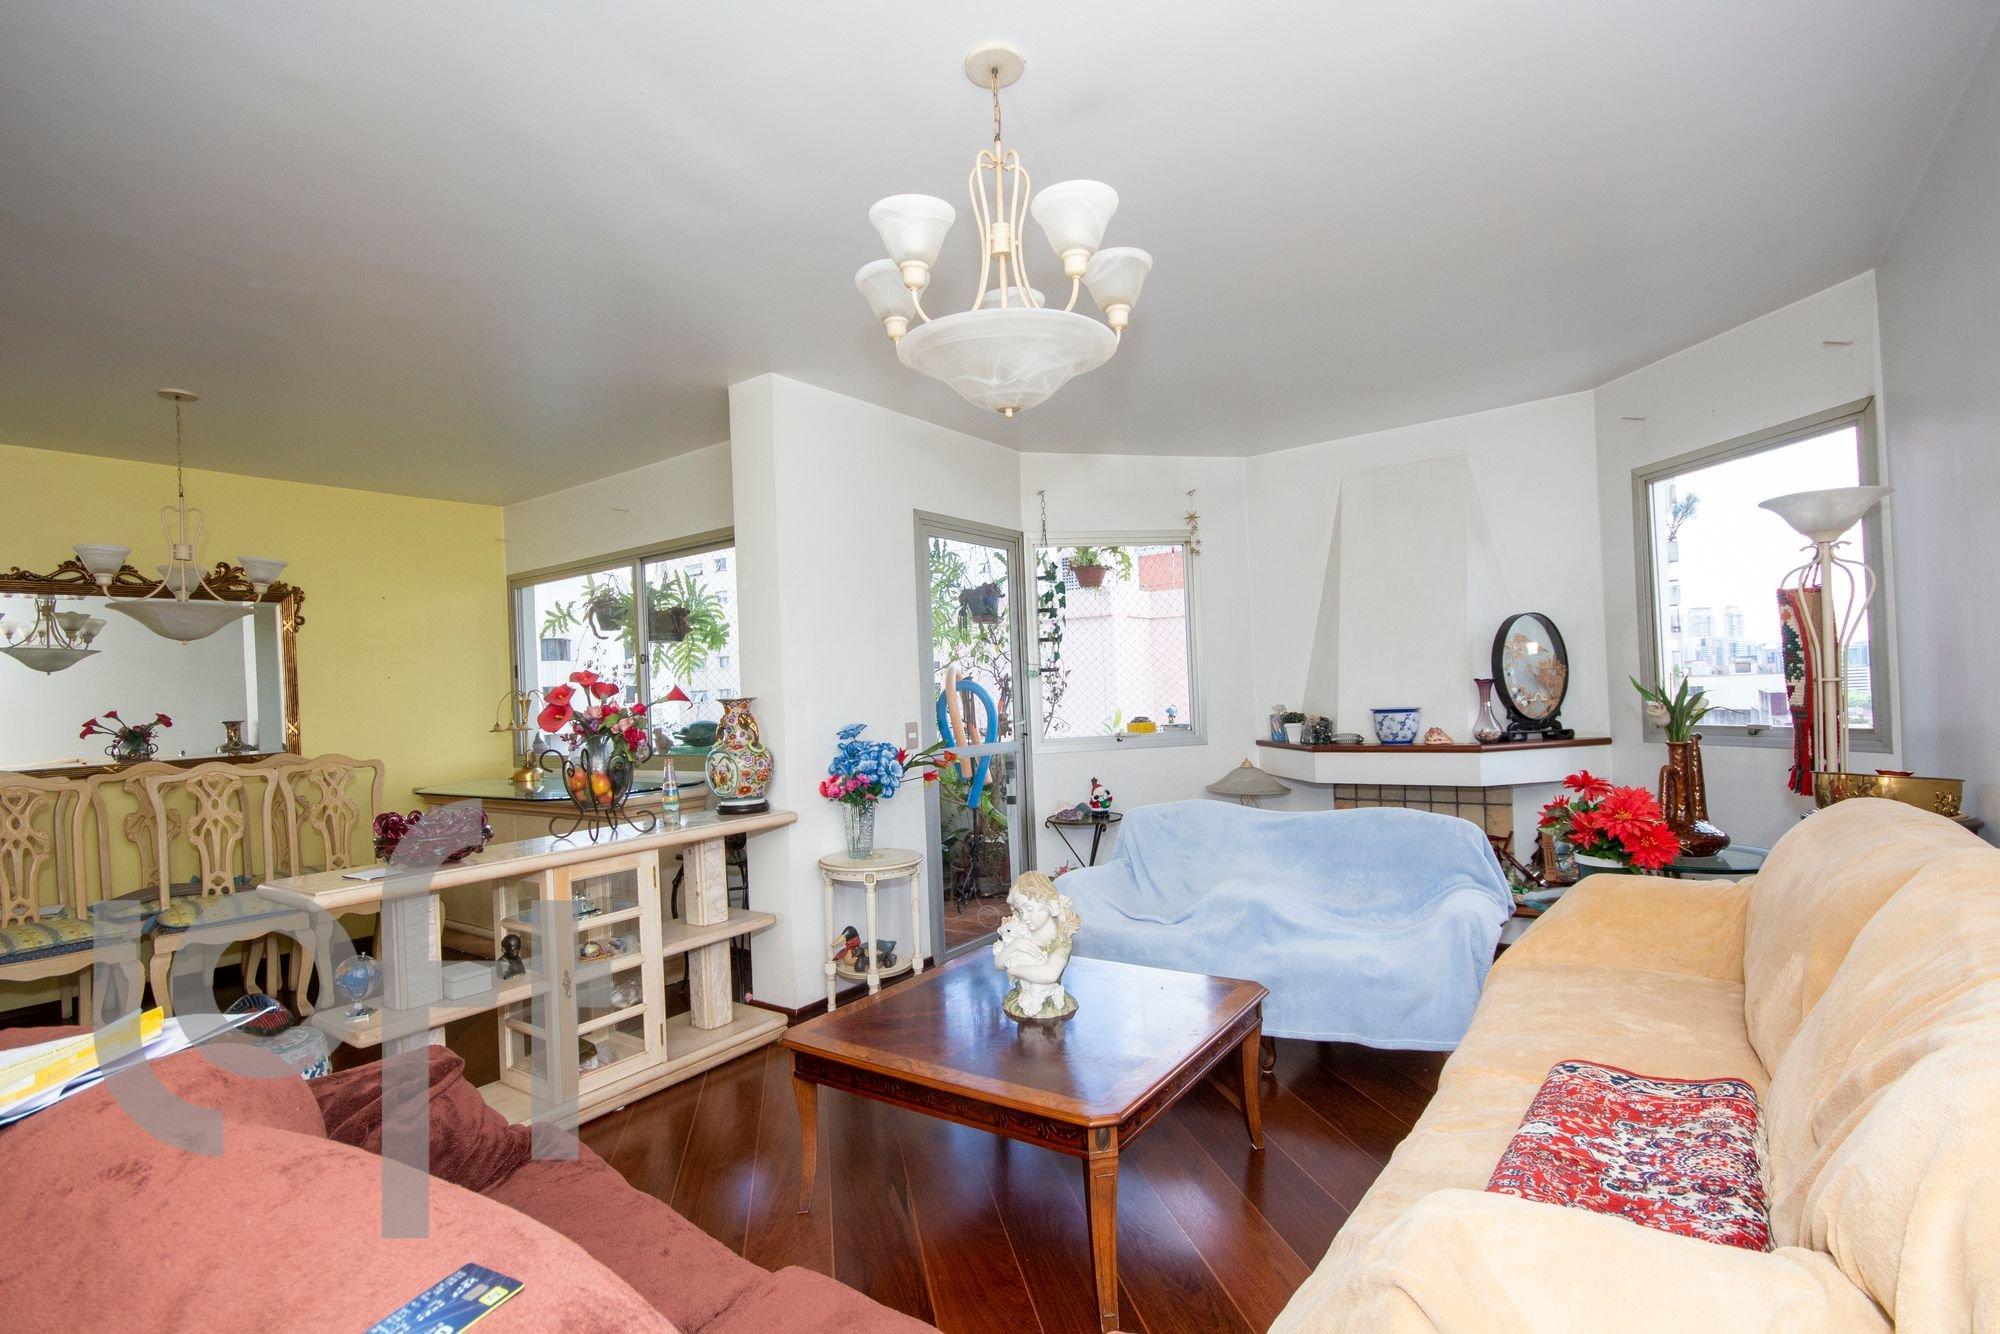 Foto de Sala com sofá, vaso, relógio, mesa de jantar